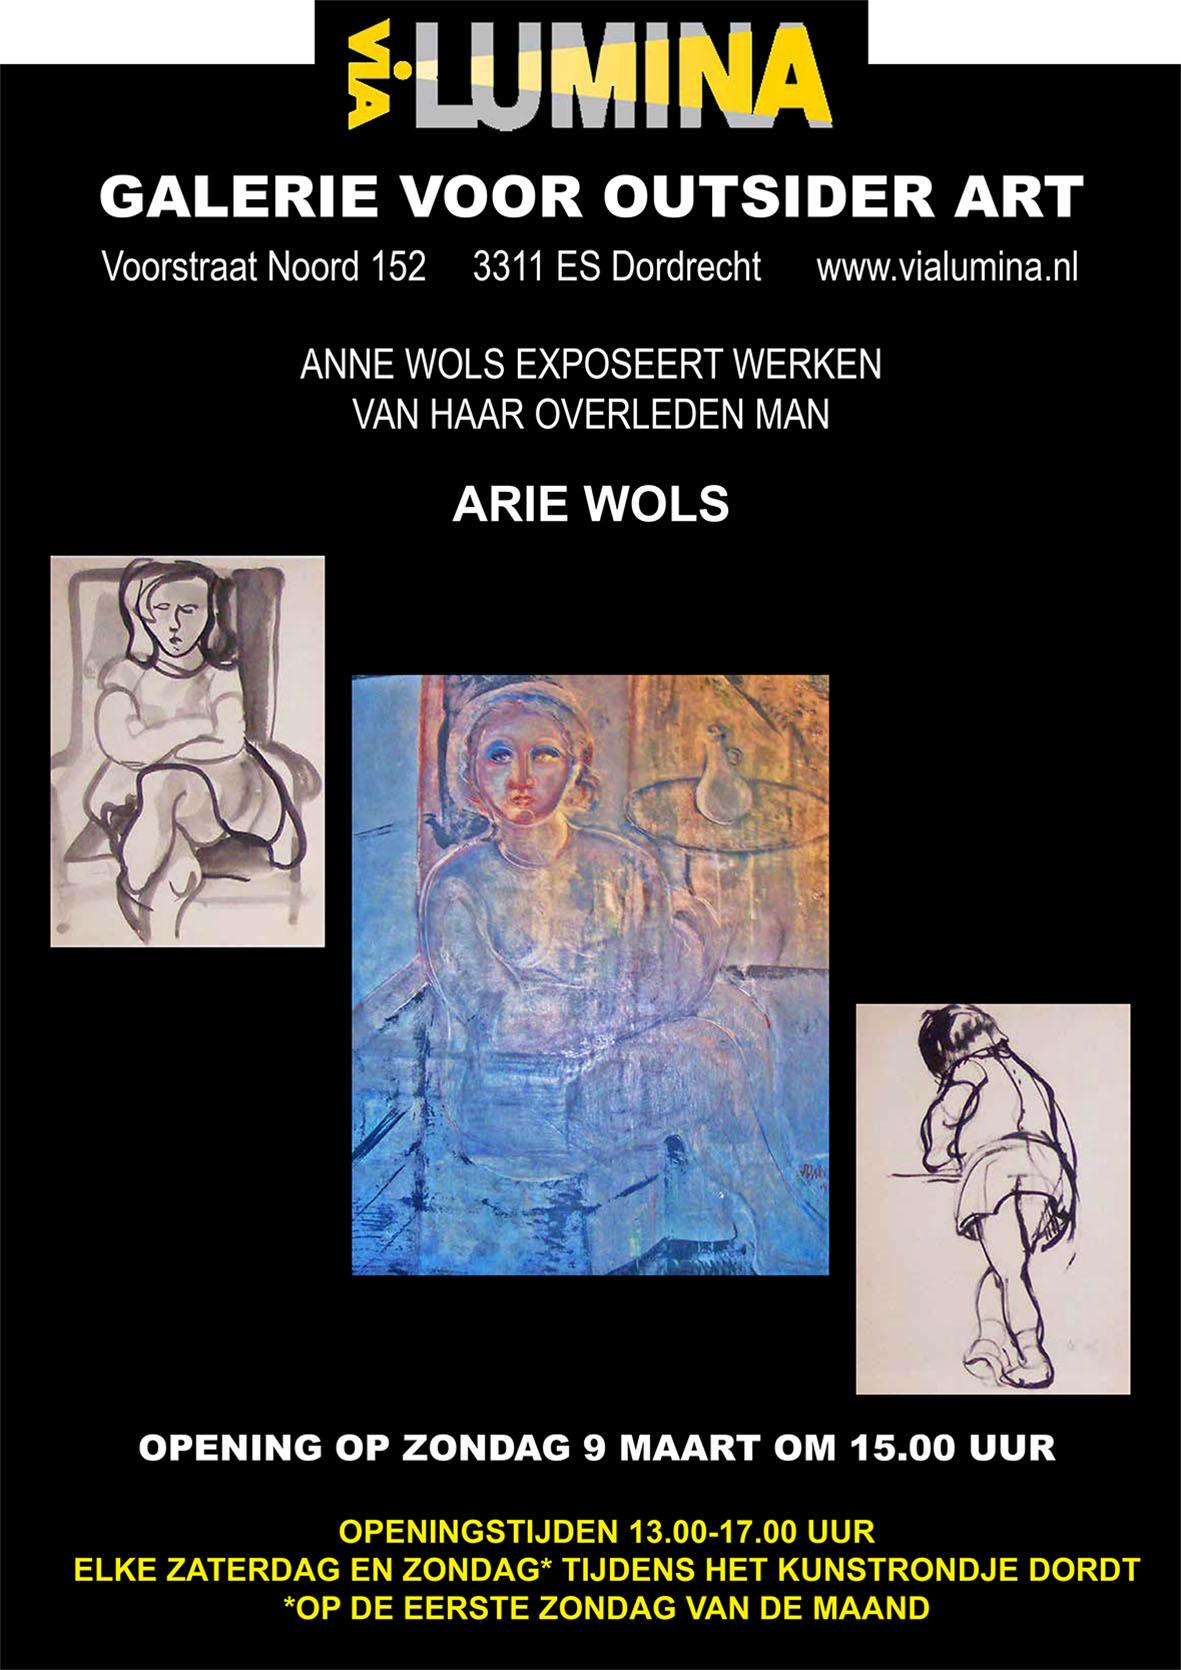 Arie Wols